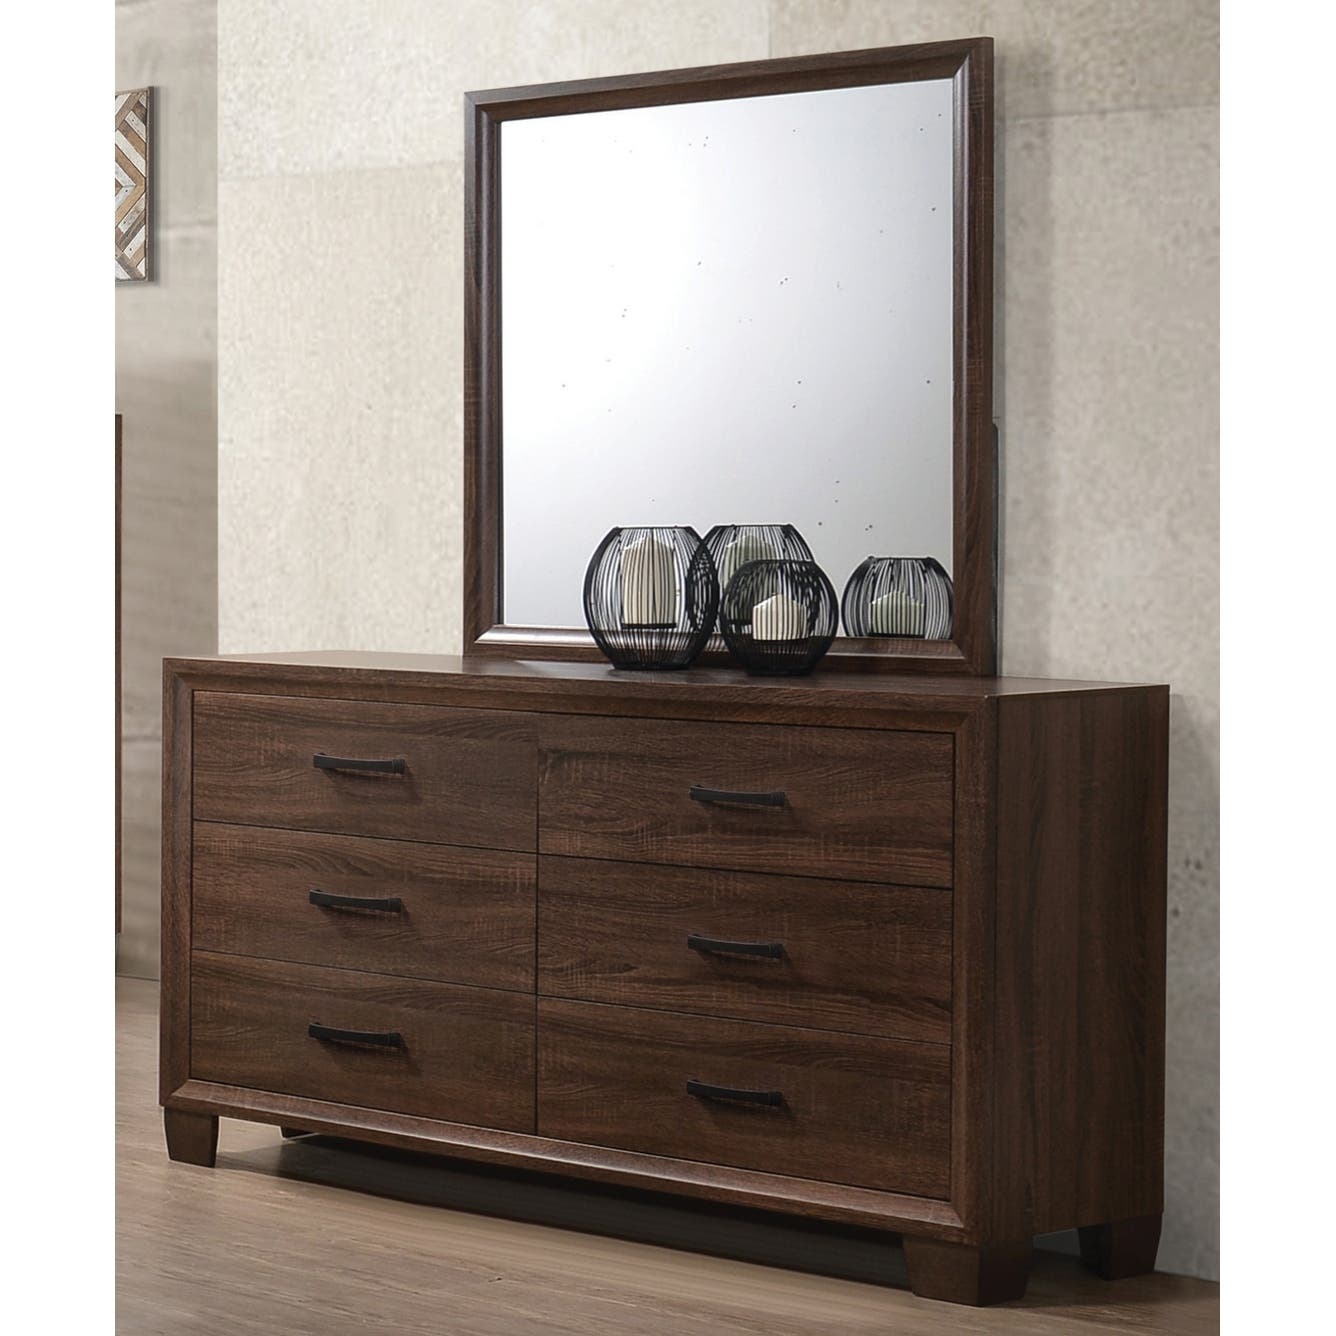 Buy Bedroom Sets Online At Overstock